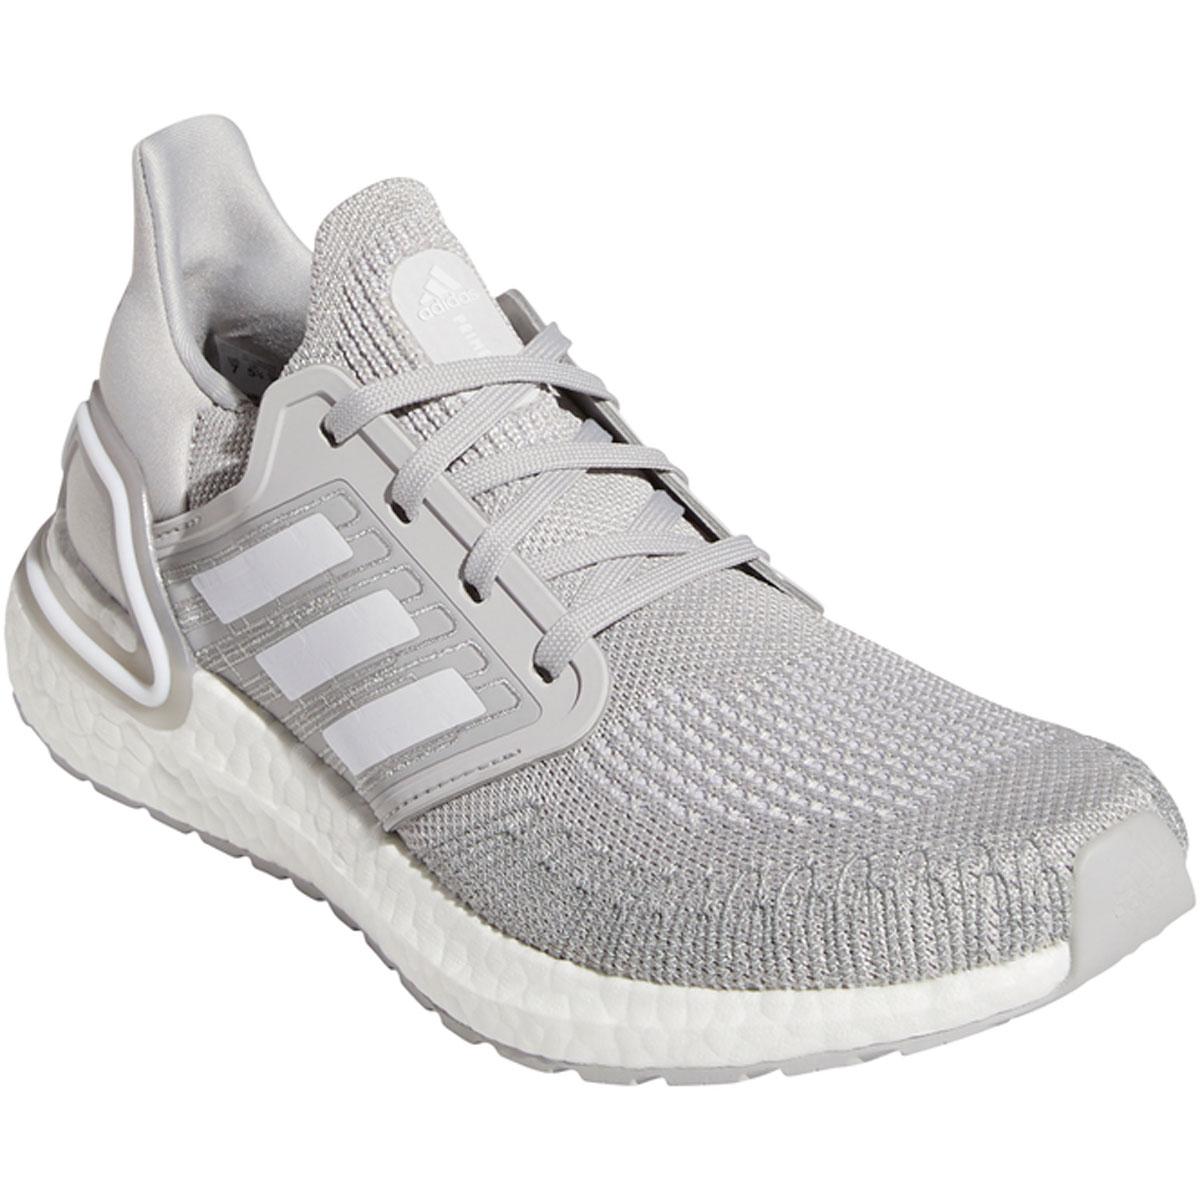 Women's Adidas Ultraboost 20 Running Shoe - Color: Grey - Size: 5 - Width: Regular, Grey, large, image 3